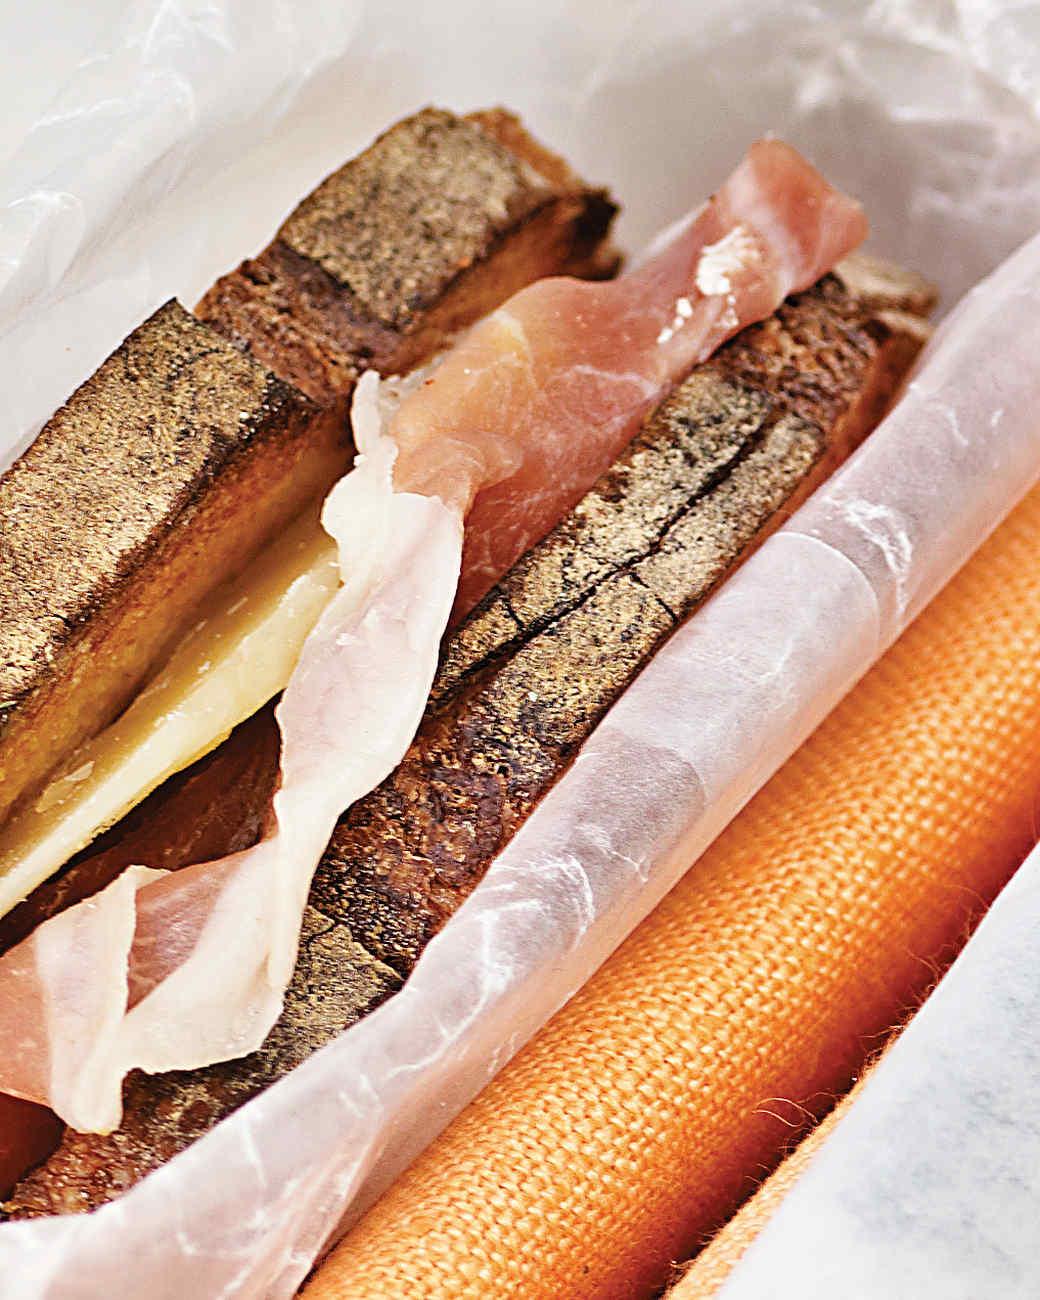 ham-cheese-sandwich-0711md106420.jpg